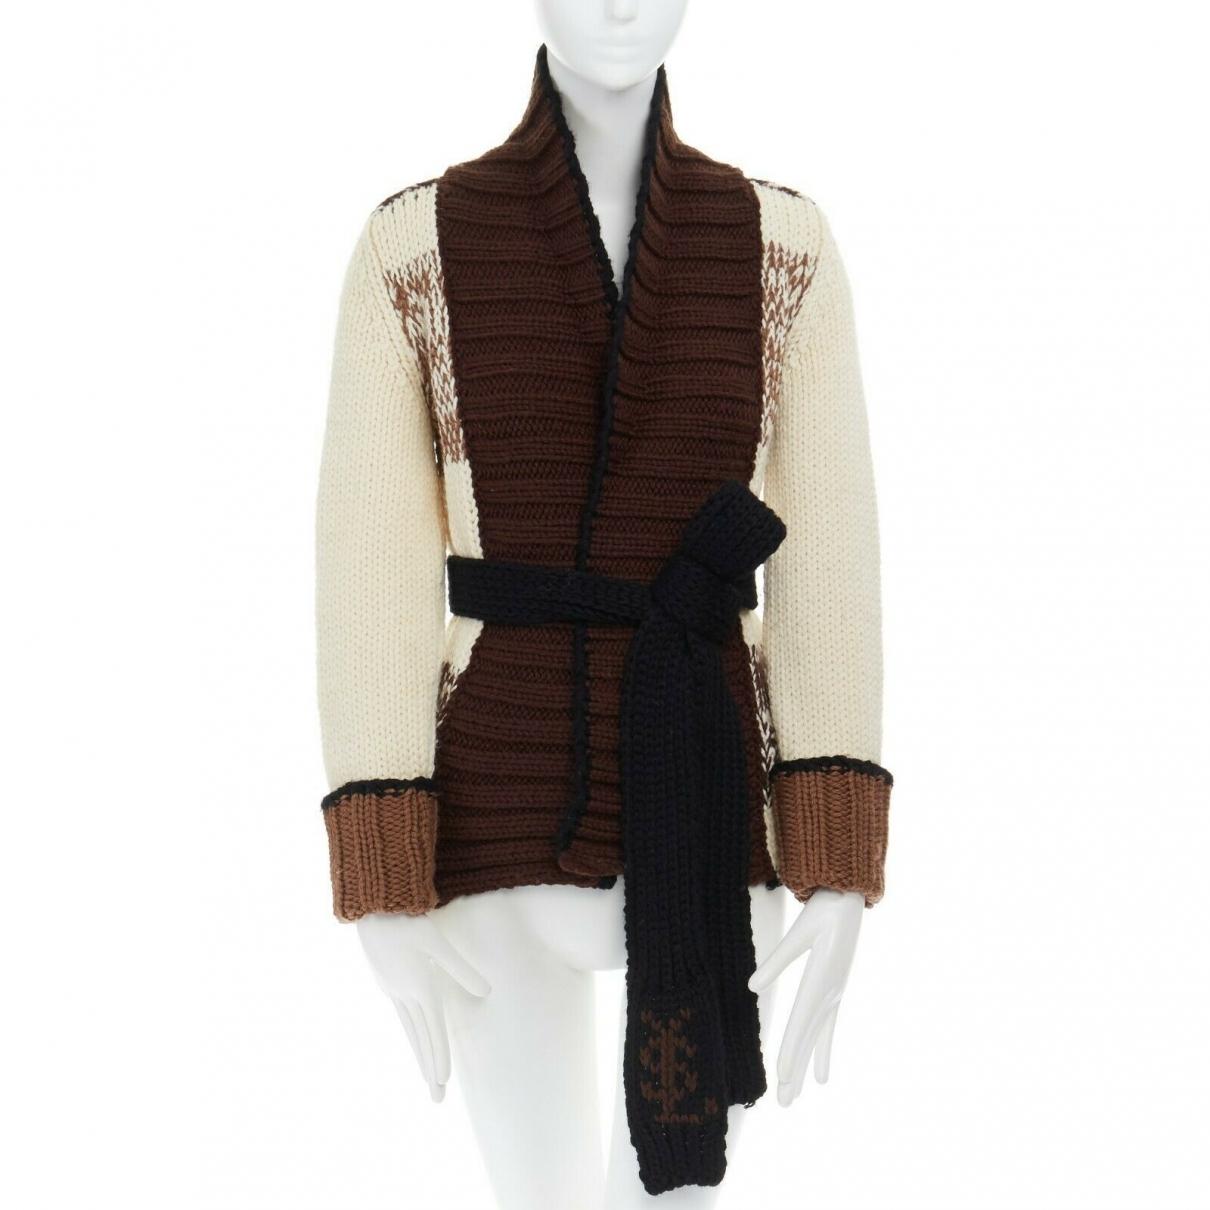 Yves Saint Laurent \N Brown Wool Knitwear for Women S International